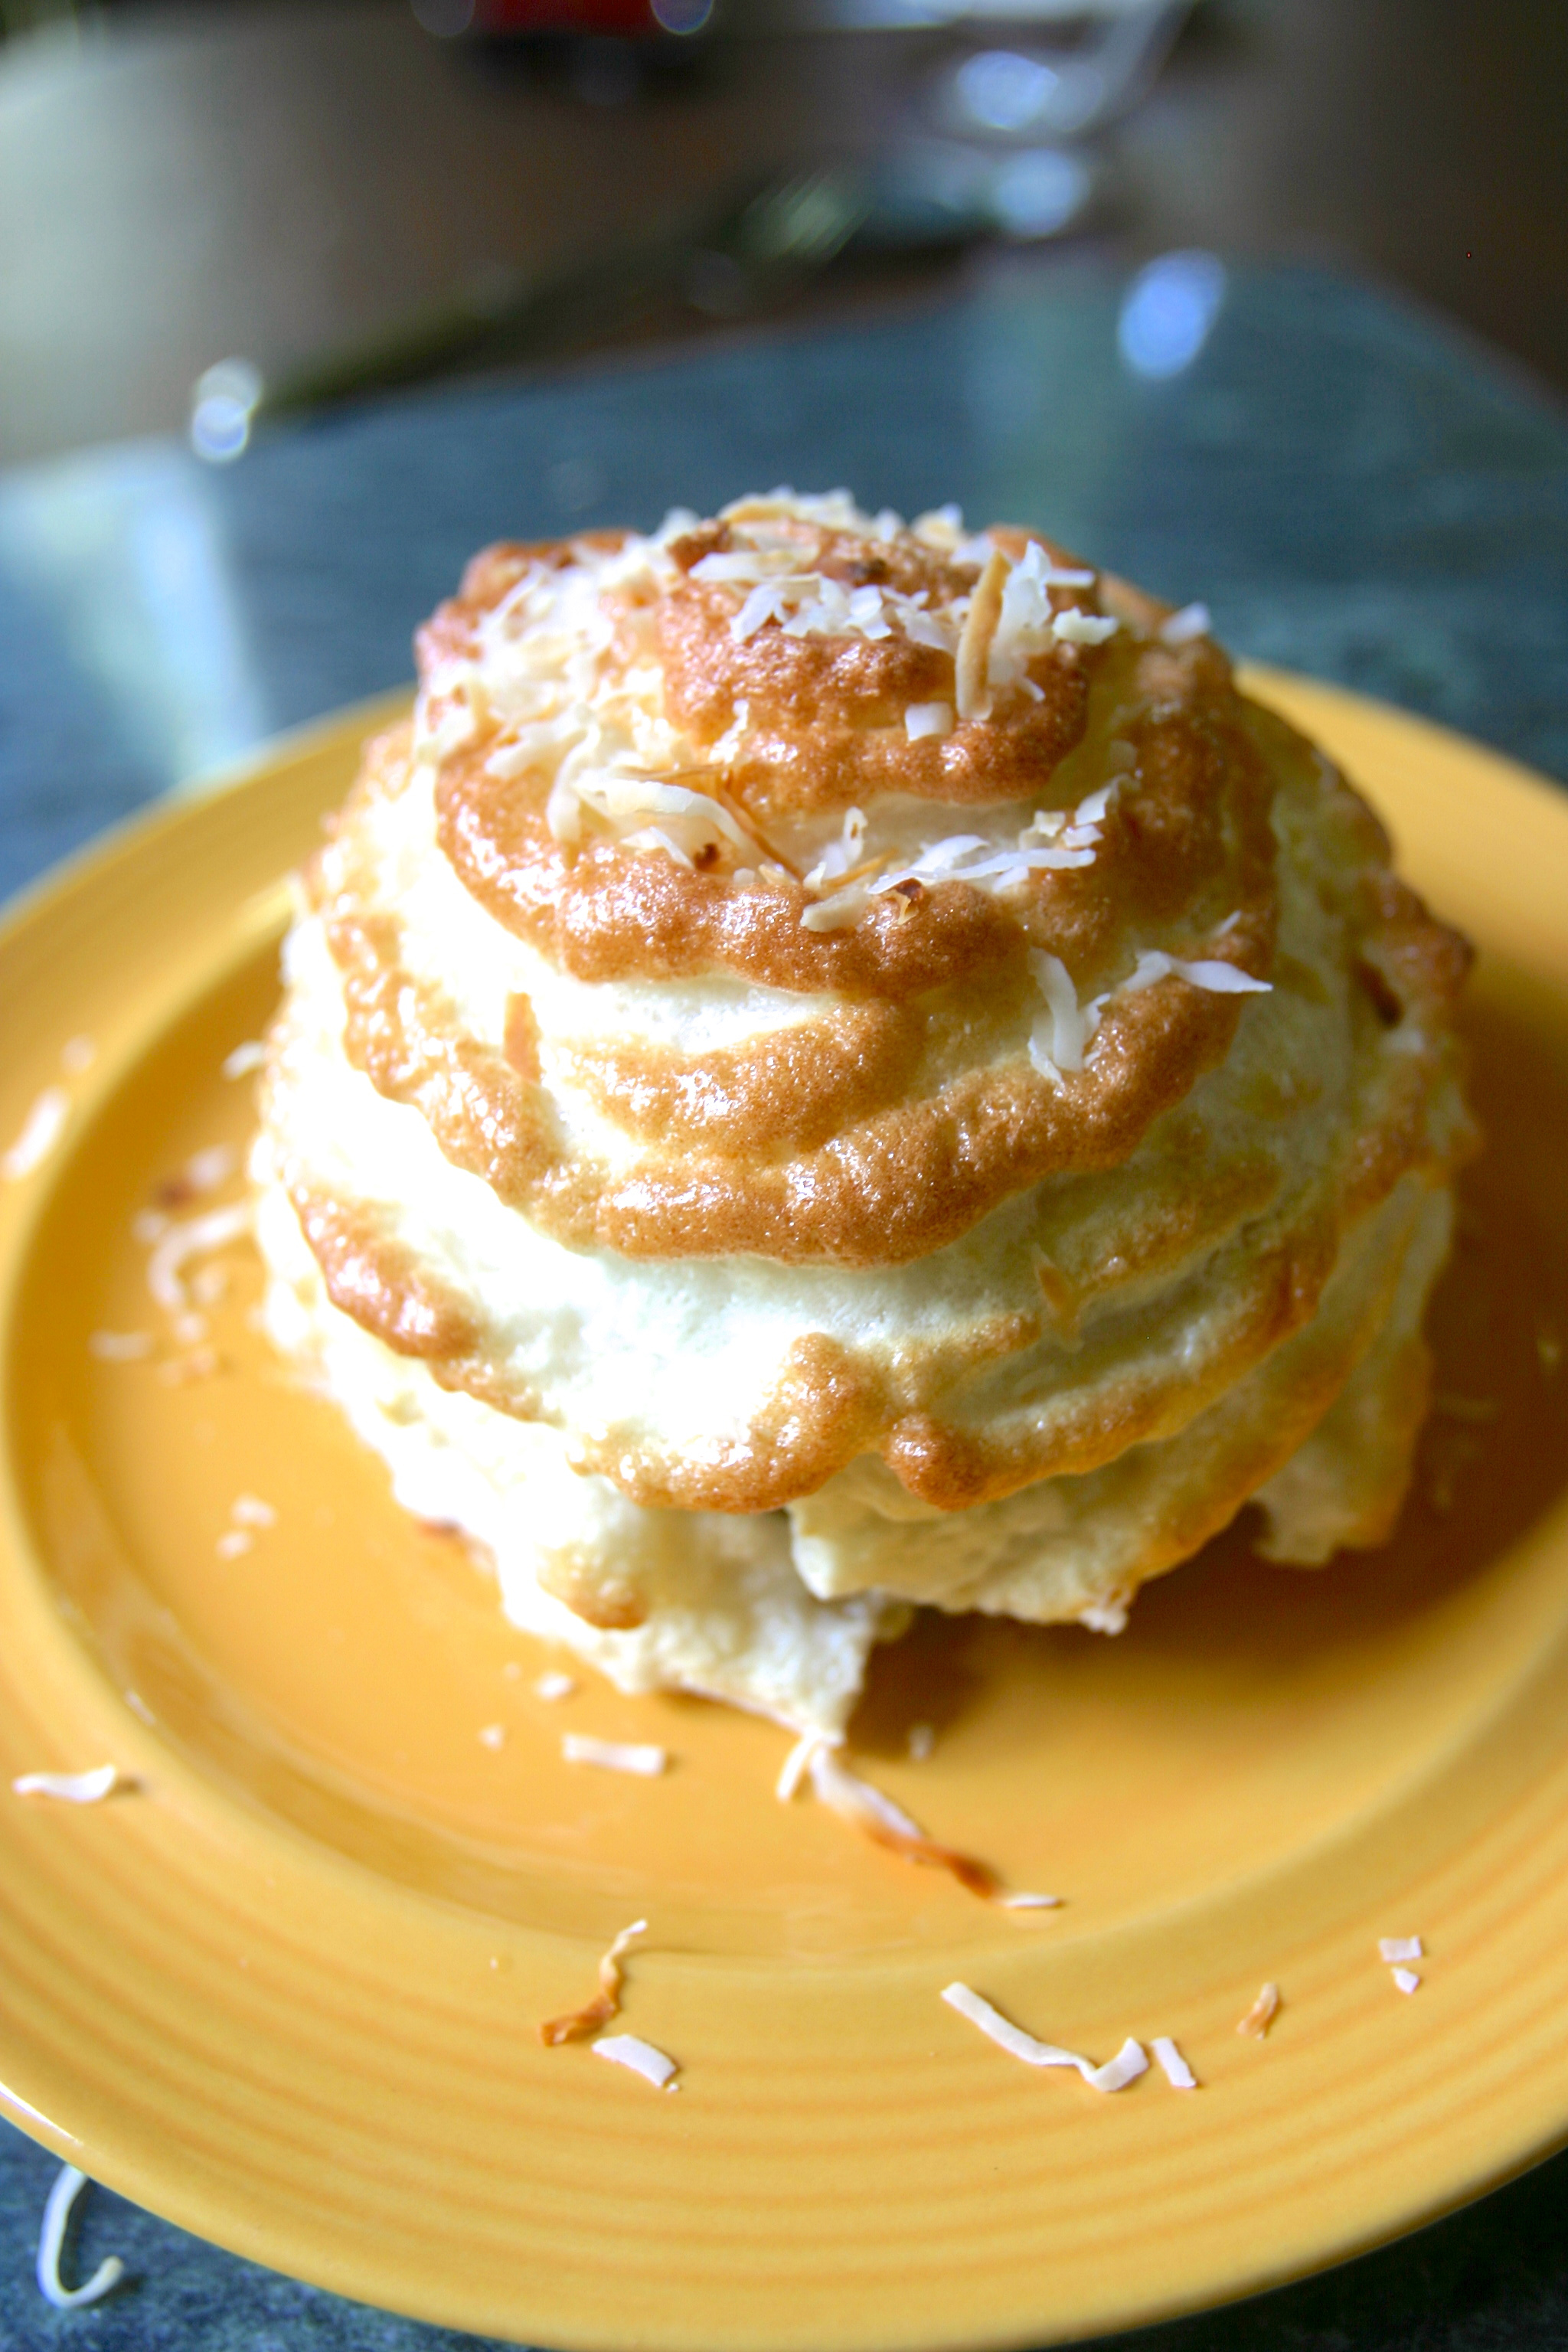 paleo banoffee baked alaska pancakes